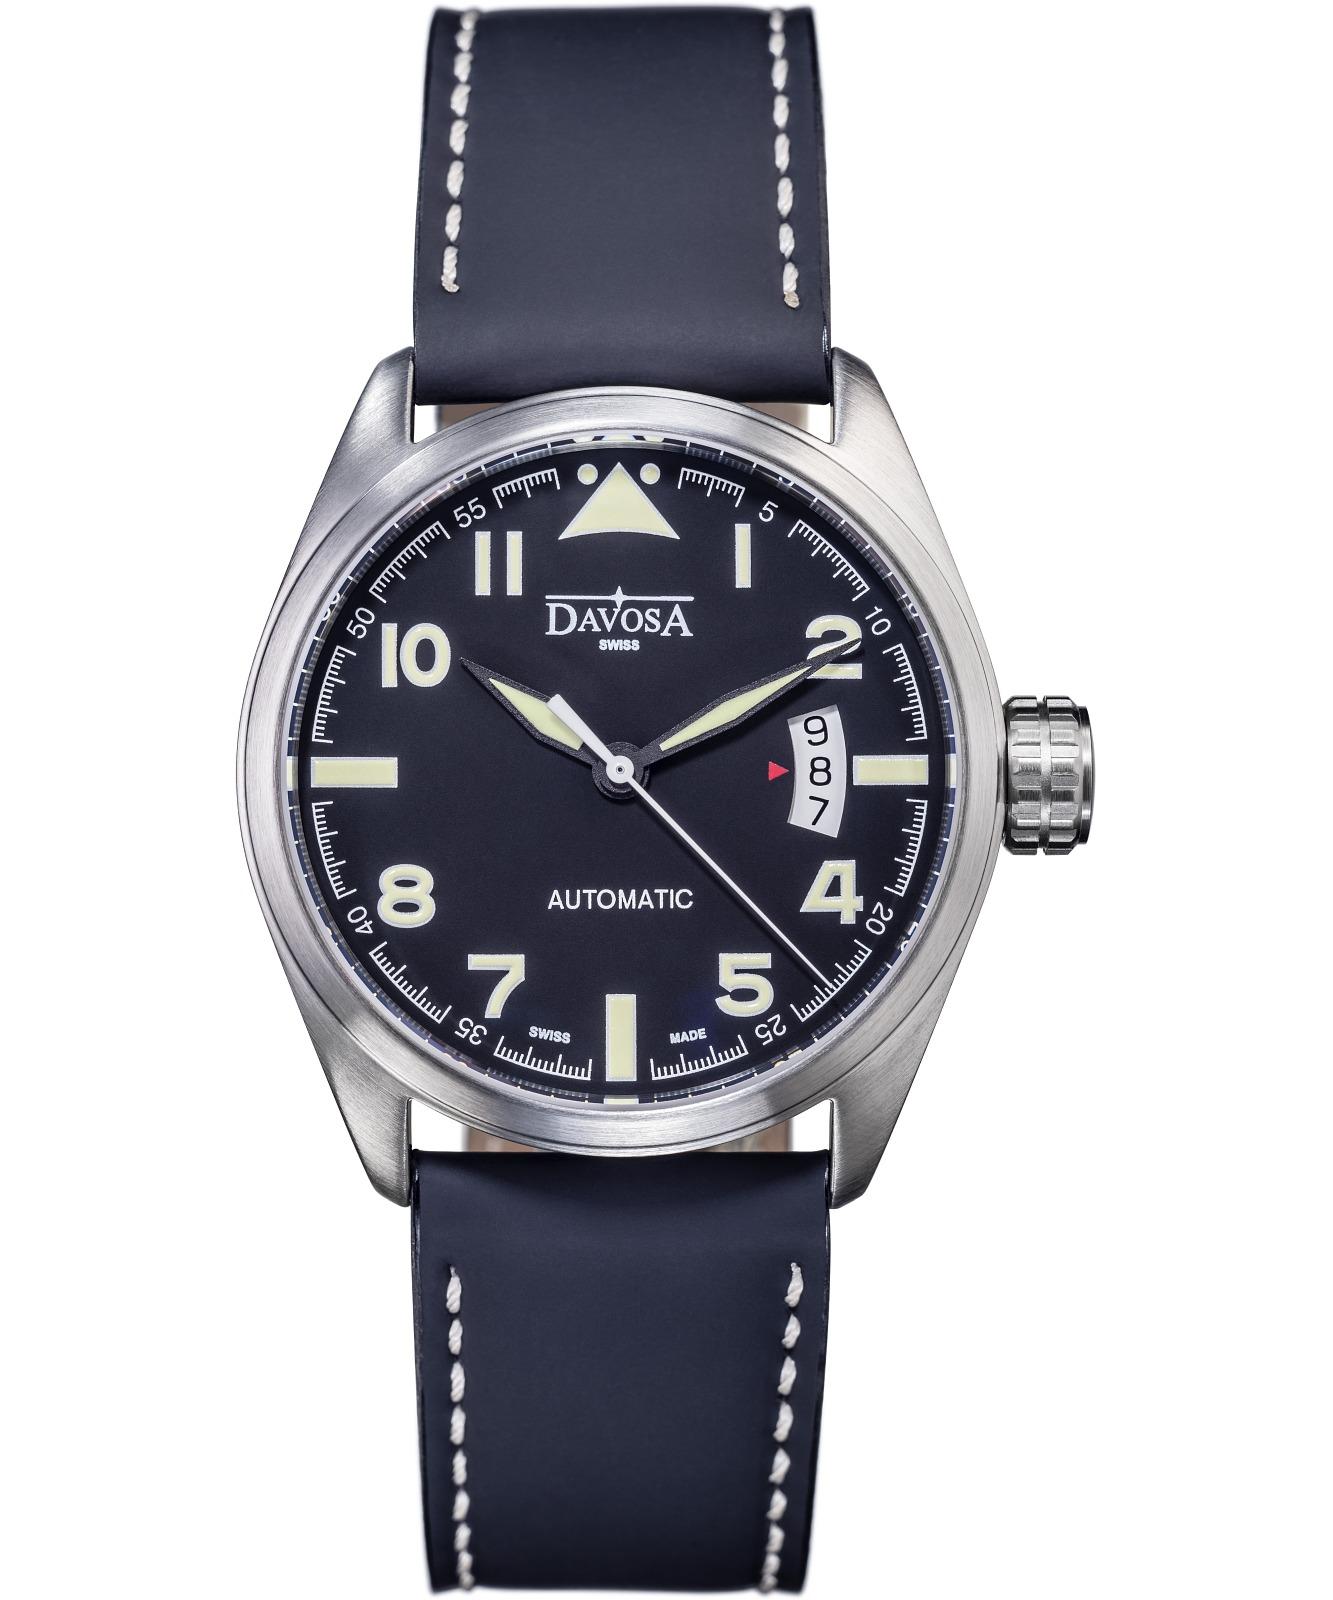 zegarek-meski-davosa-military-automatic-161-511-54